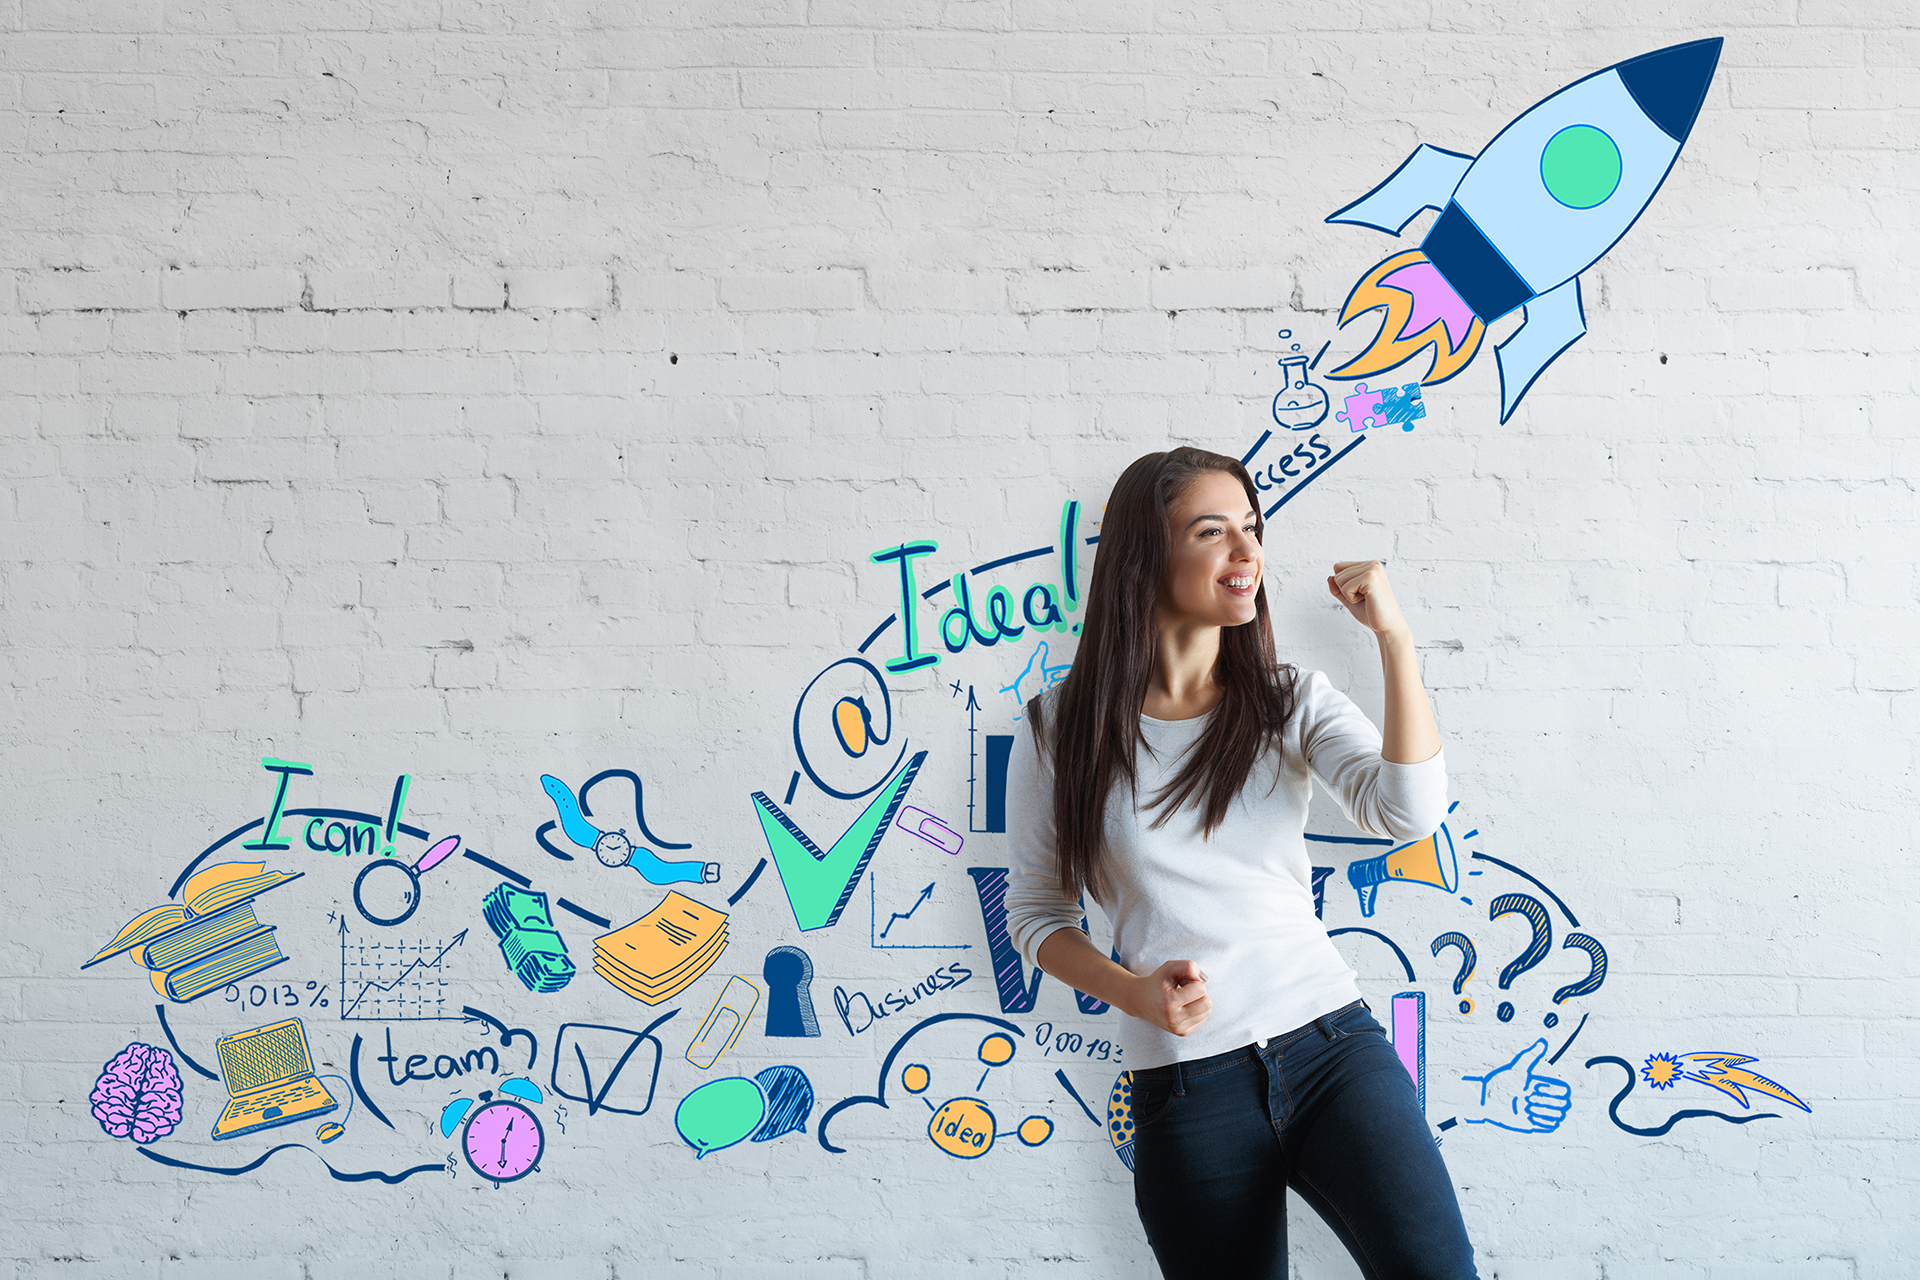 Antreprenoriat tehnologic în limbi străine